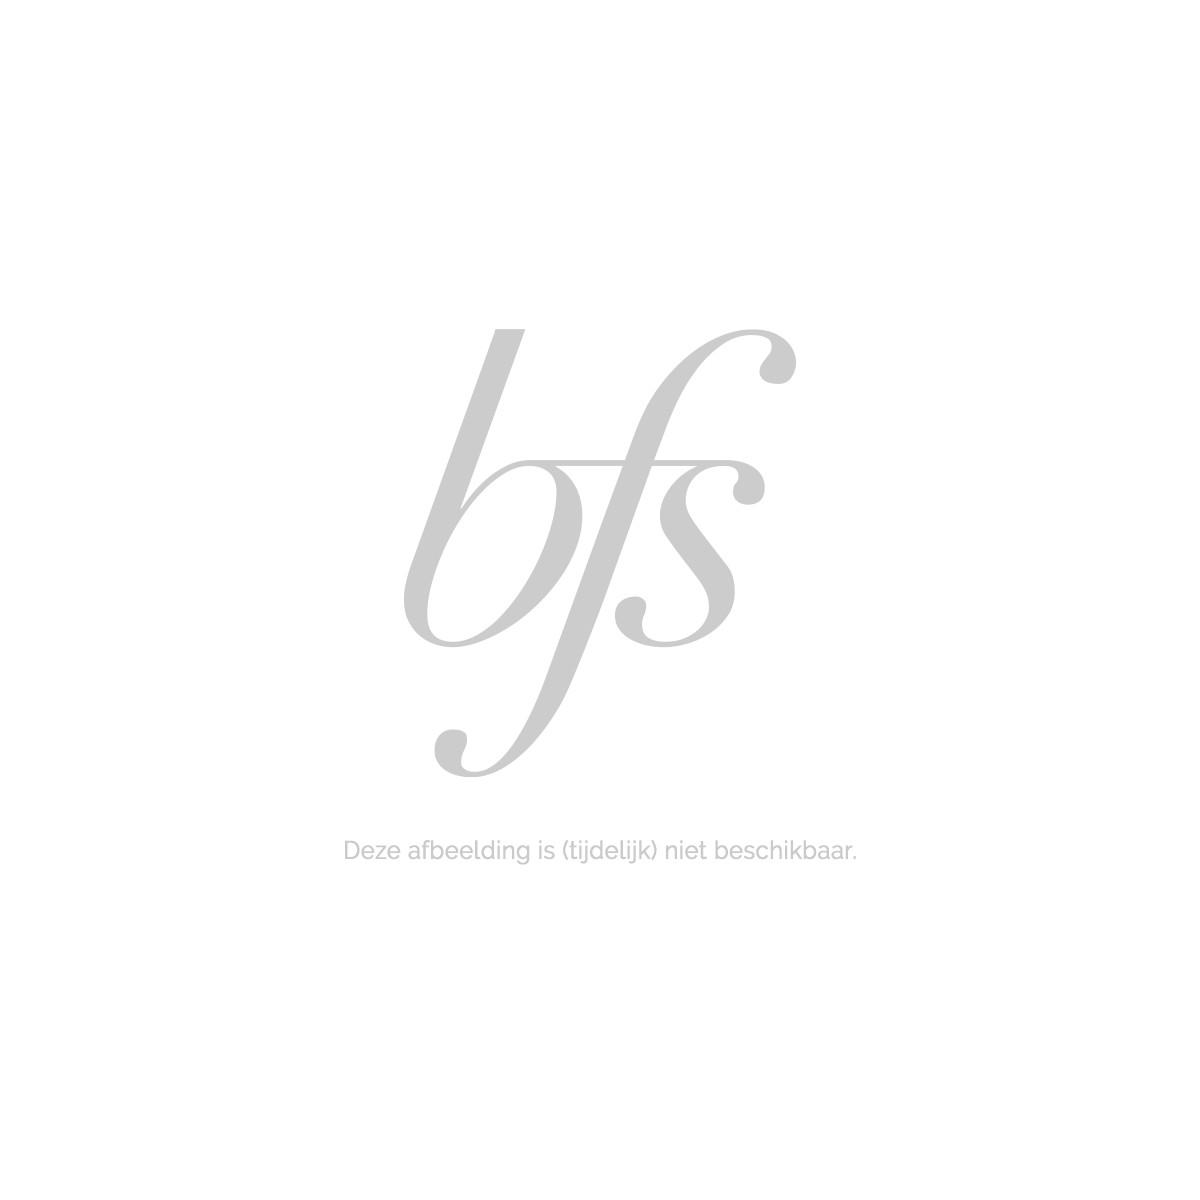 Afbeelding van Casmara Firming Moisturizing Cream 50Ml Hydra Lifting / Beauty